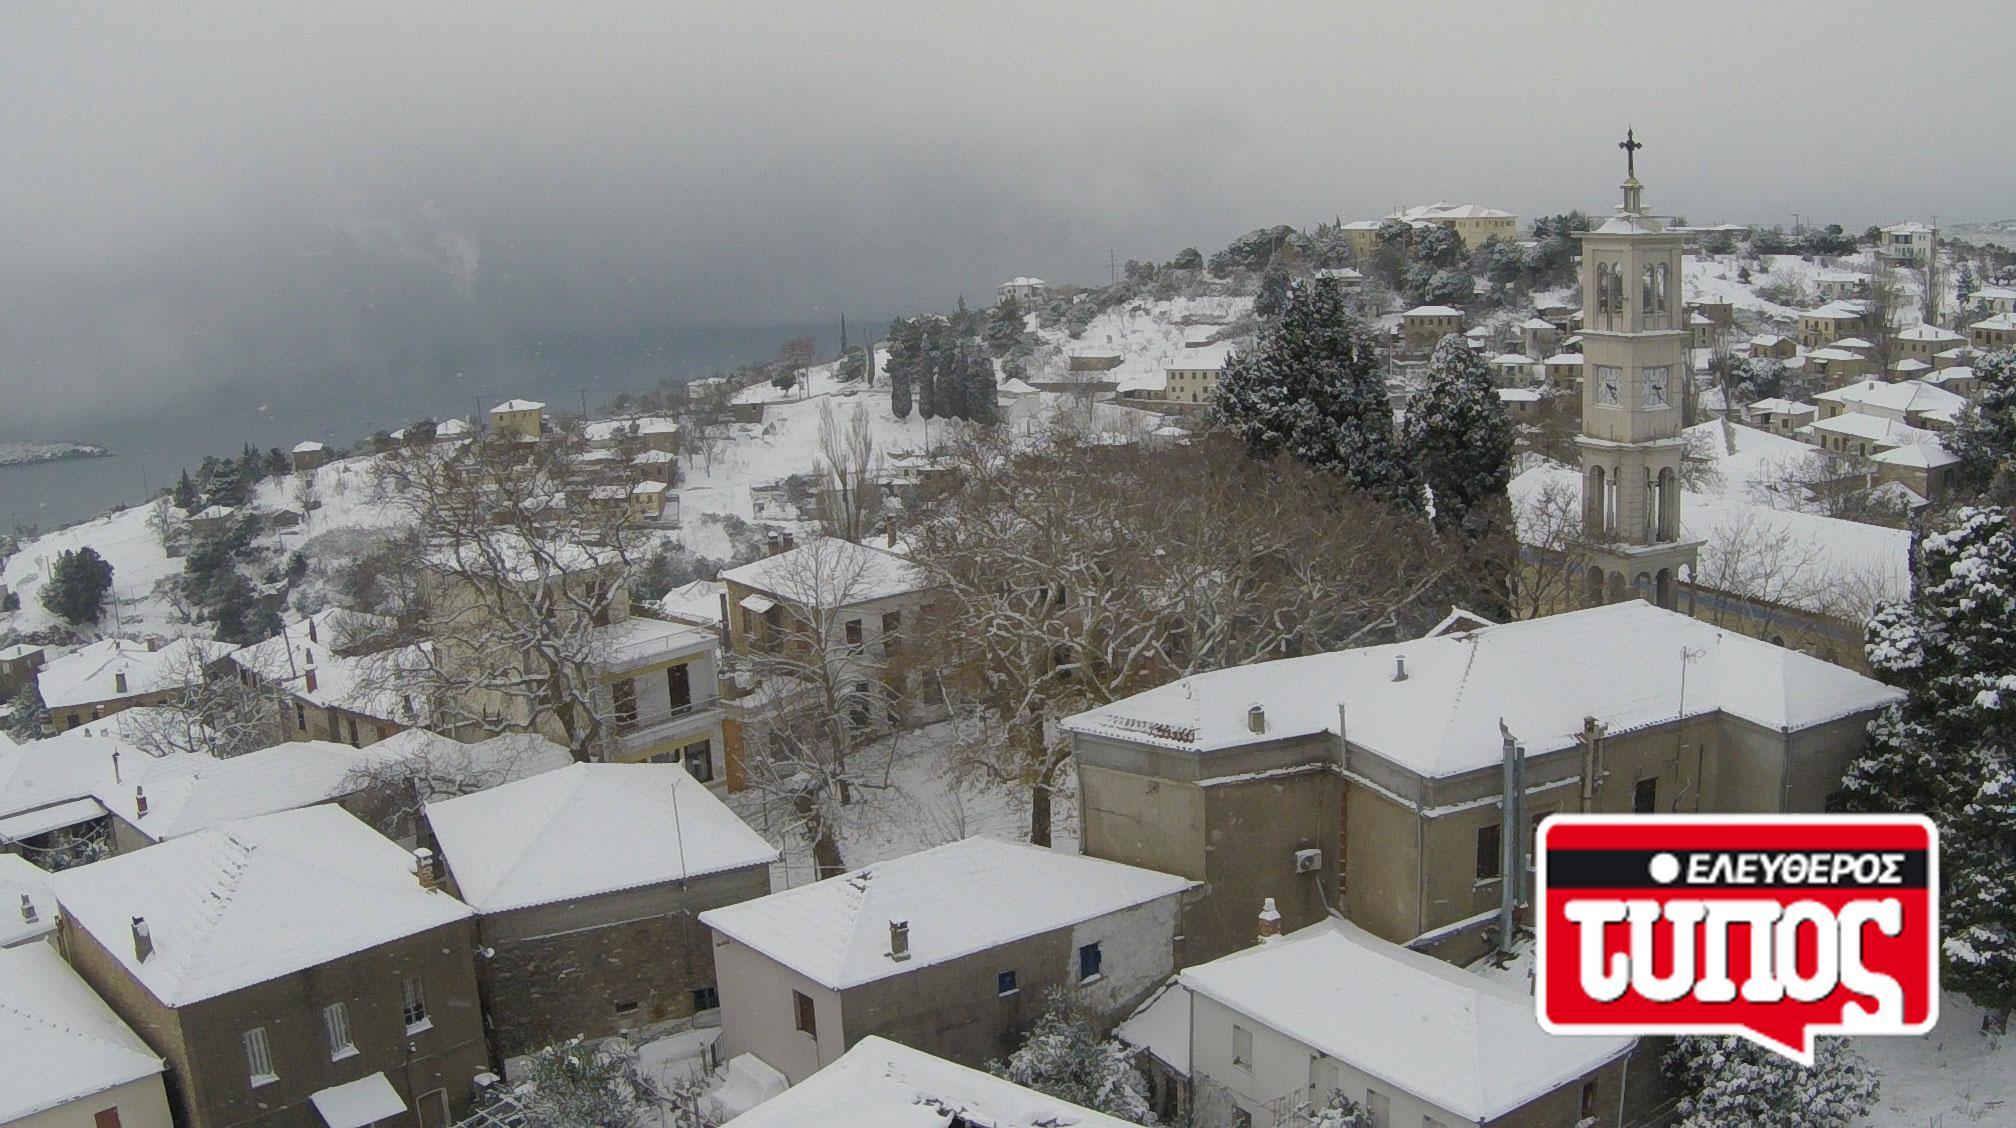 laukos-piliou-xionismenos-aerofotografies-1300-6 Εντυπωσιακές αεροφωτογραφίες από το χιονισμένο Λαύκο Πηλίου [εικόνες]